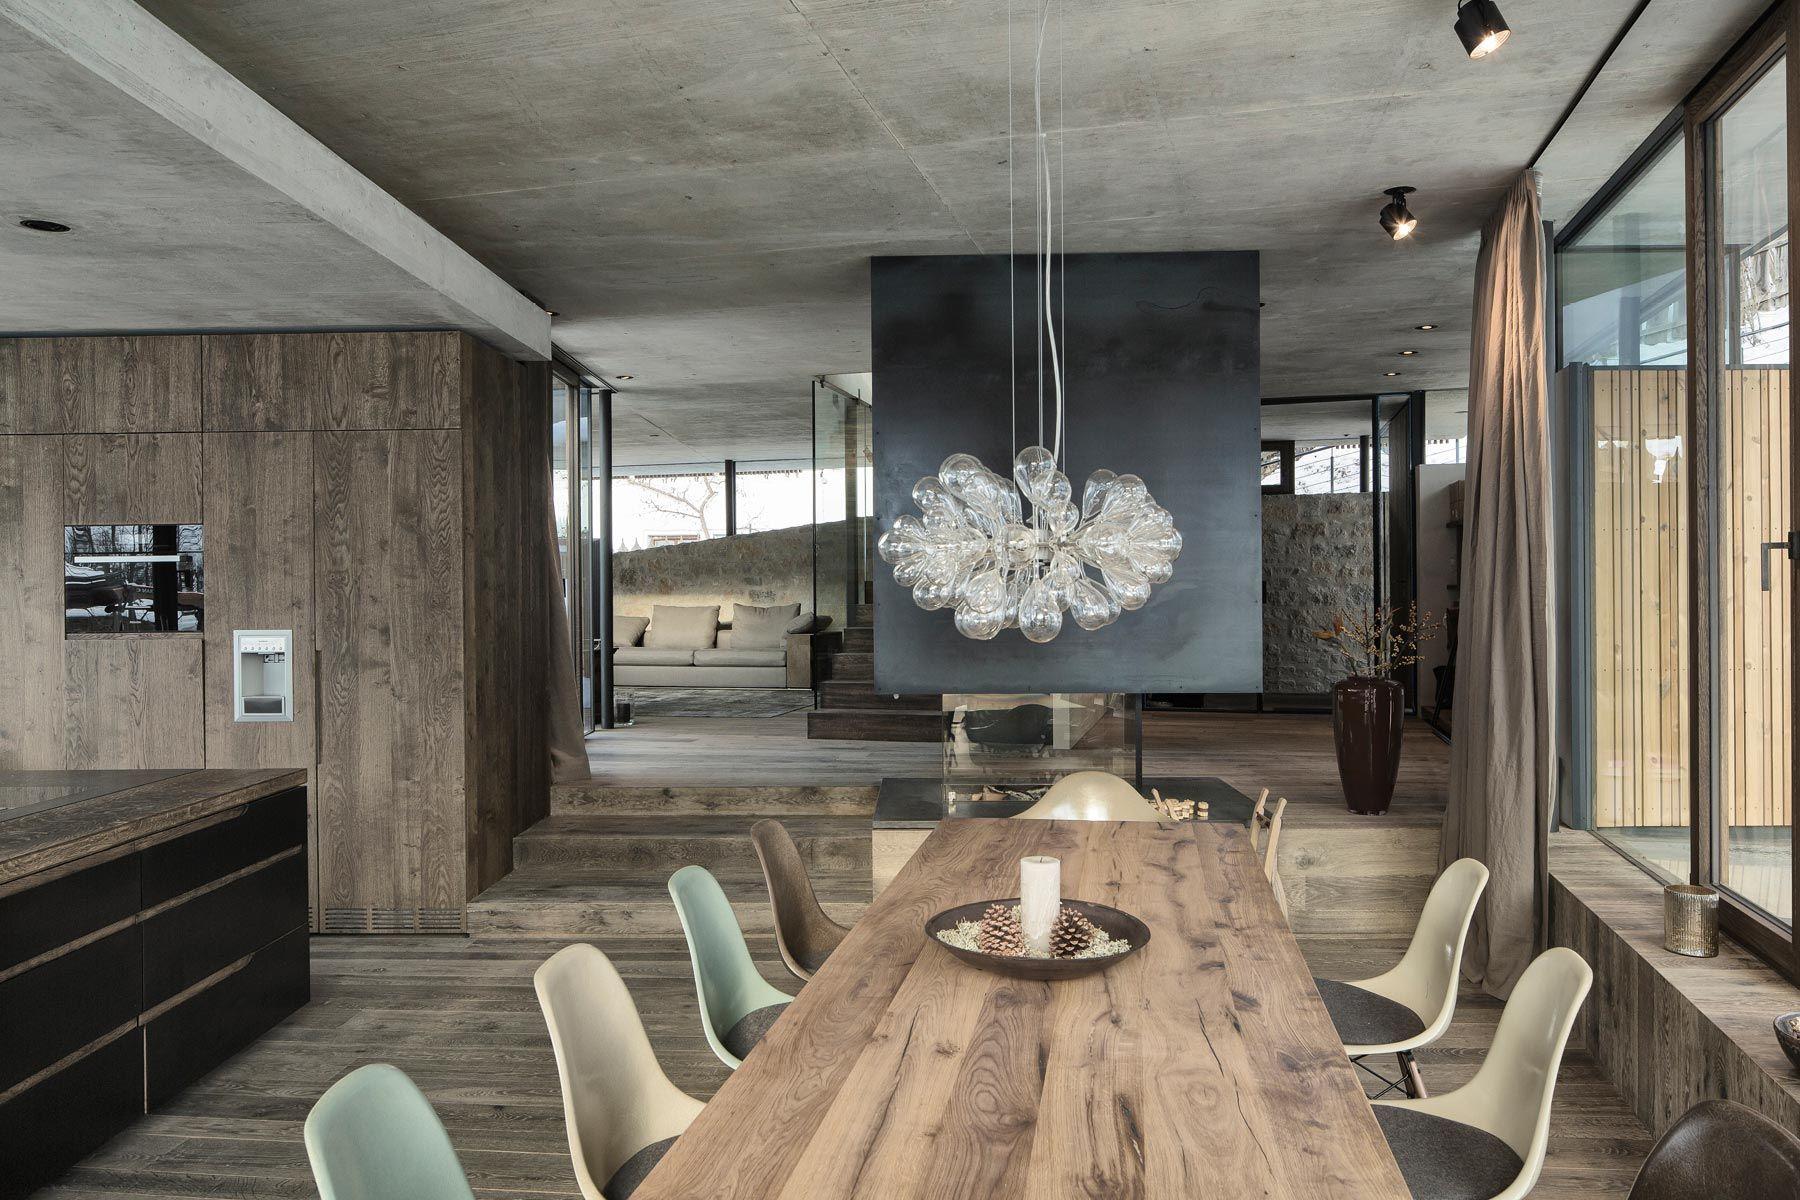 haus walde 2011 2012 kitzb hel tirol planung n umsetzung gogl architekten interior n. Black Bedroom Furniture Sets. Home Design Ideas